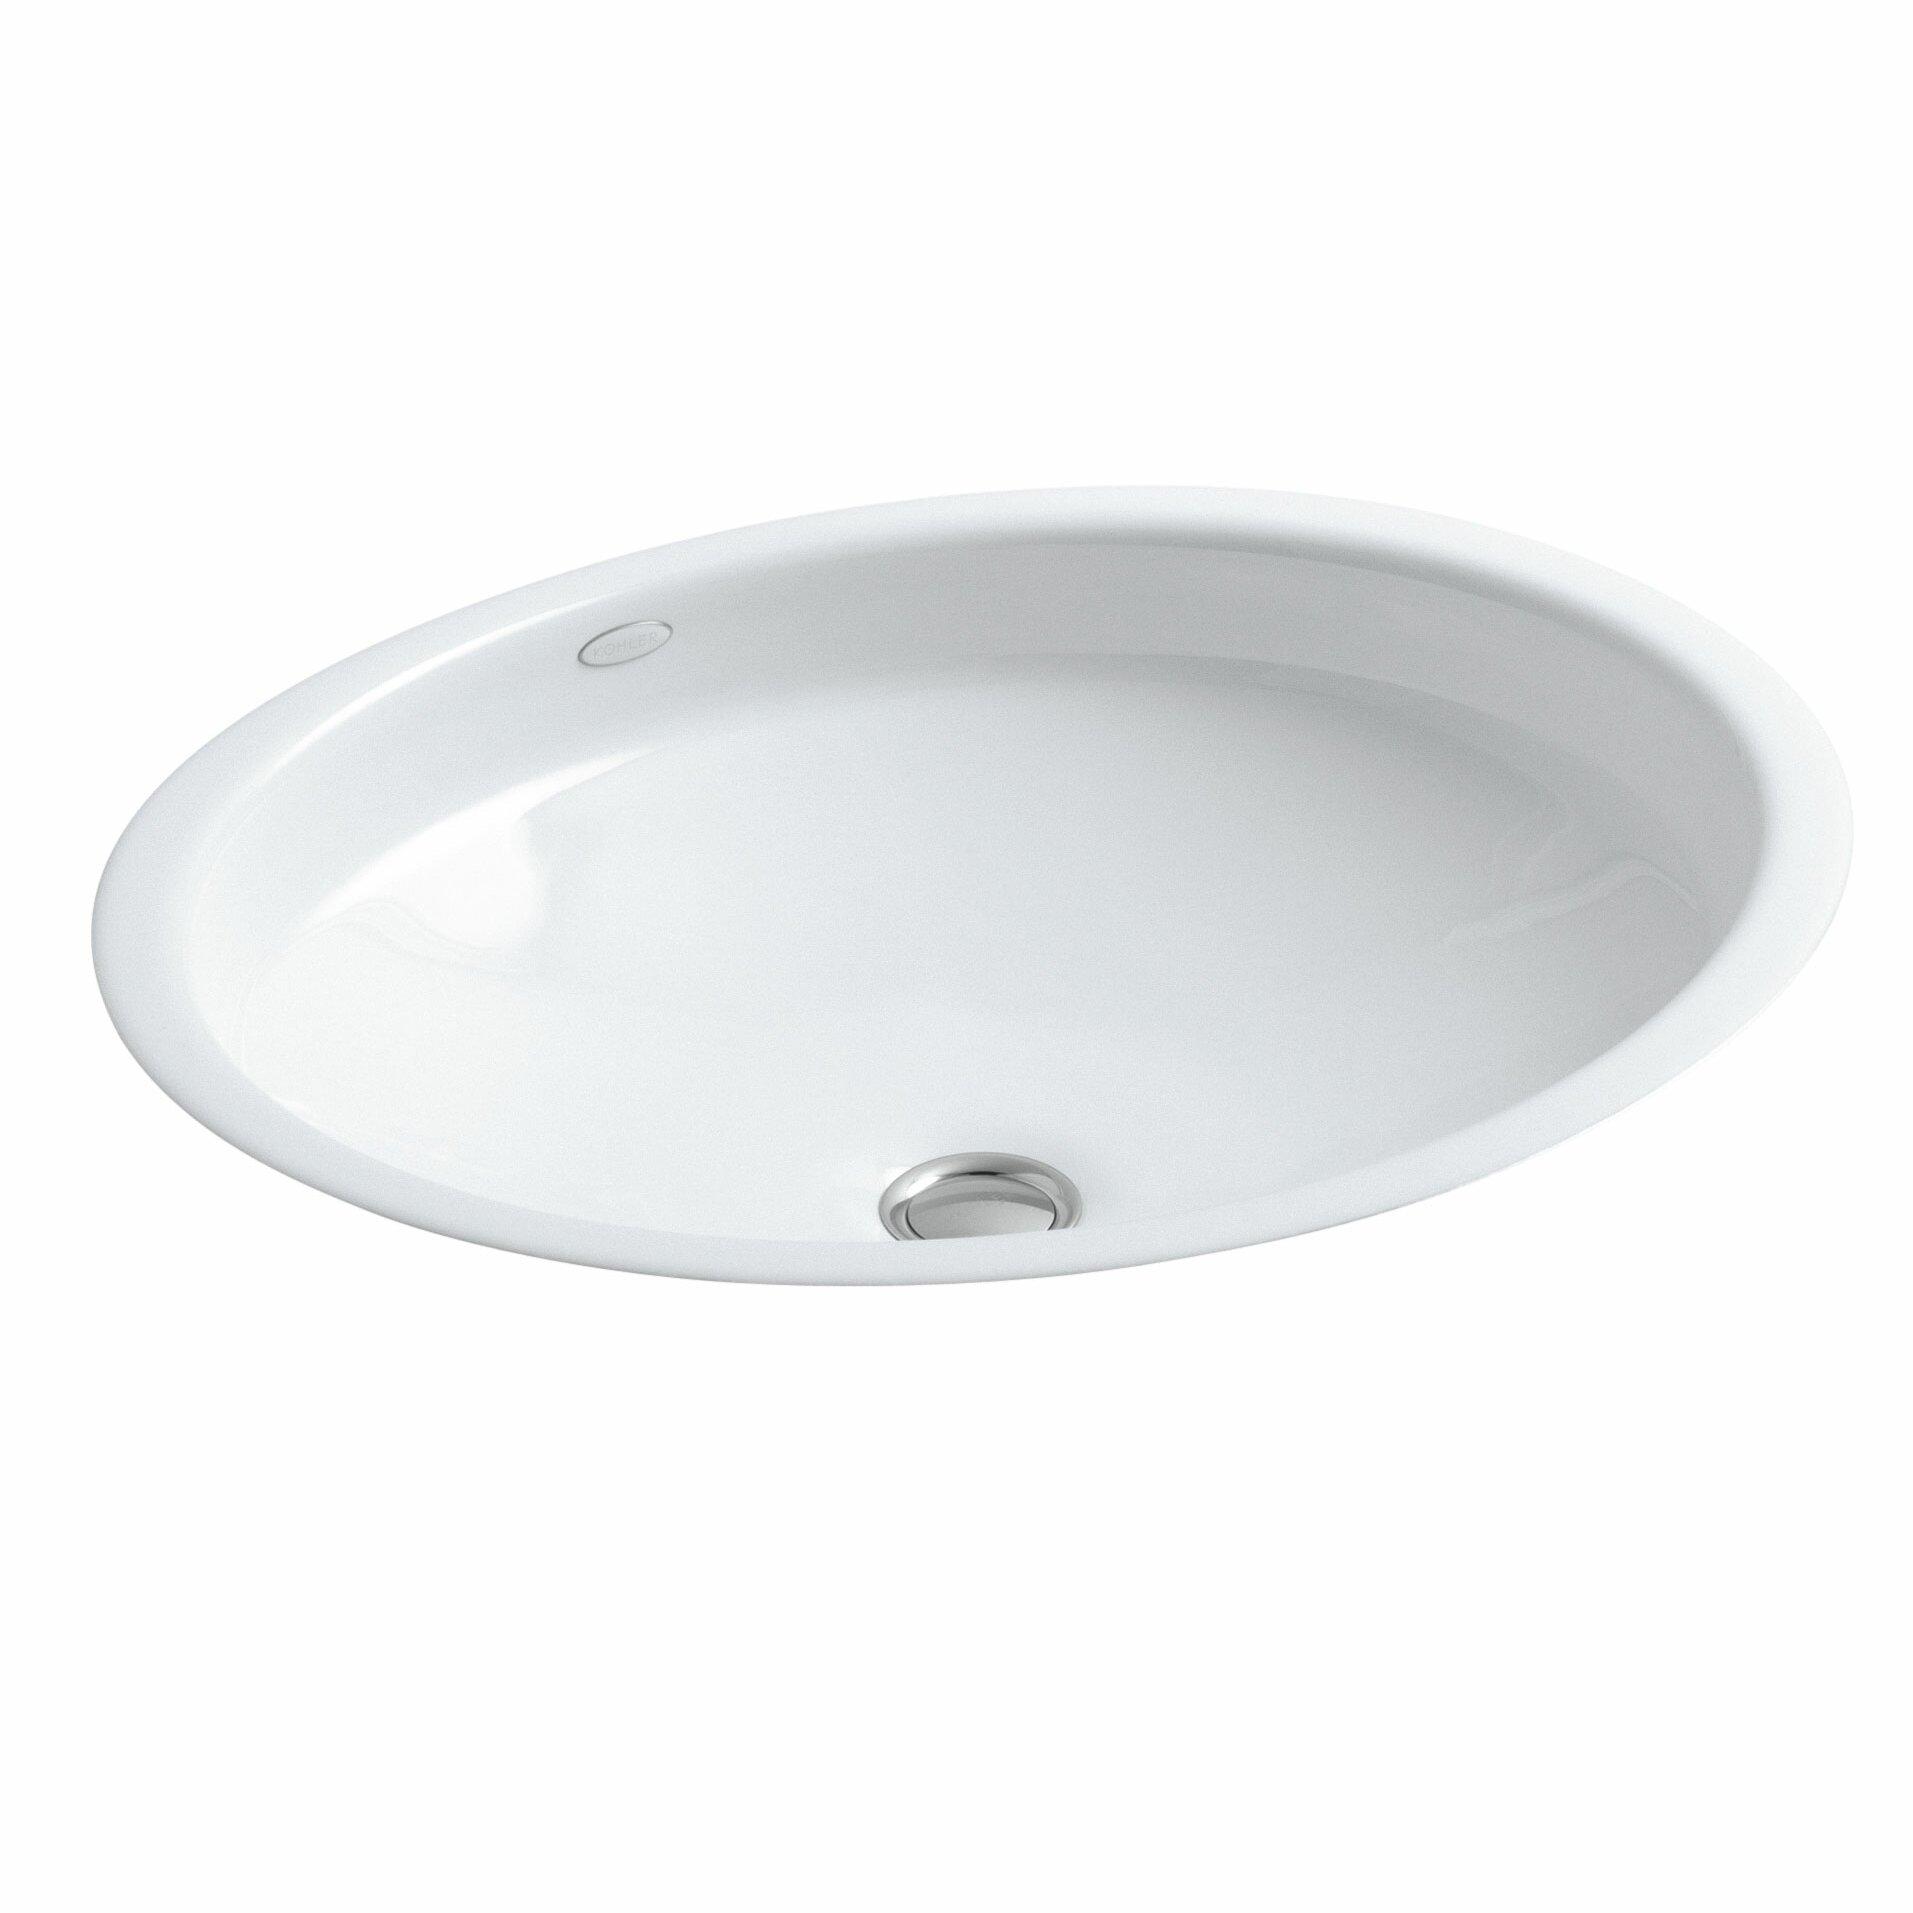 Canvas Undermount Bathroom Sink by Kohler